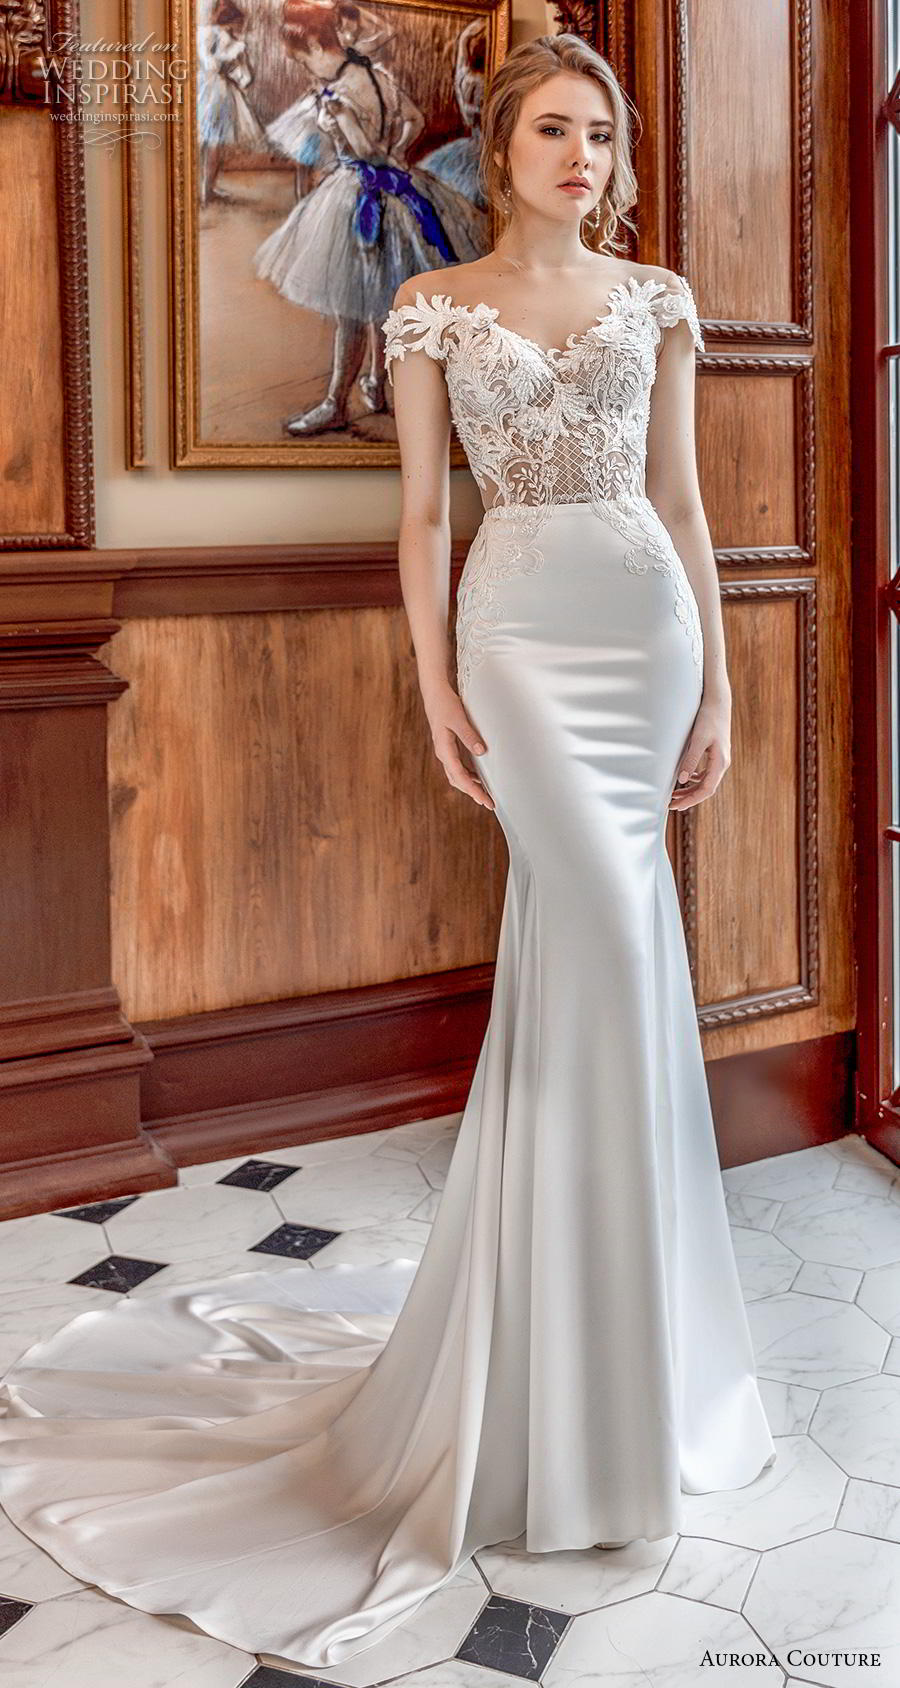 aurora couture 2019 bridal cap sleeves off the shoulder v neck heavily embellished bodice elegant sheath wedding dress corset back medium train (15) mv